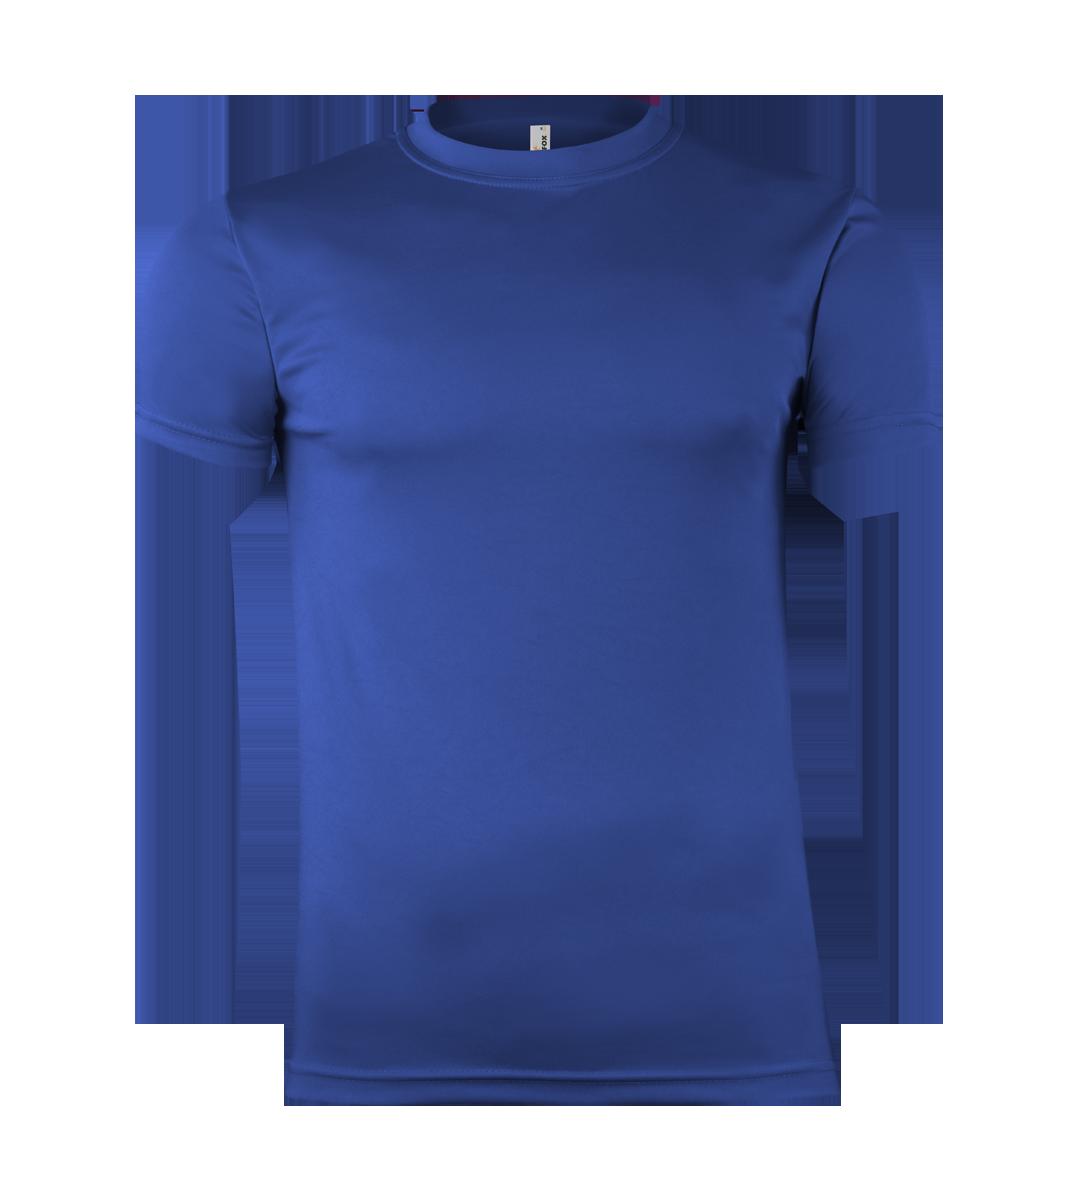 Unisex trička AlexFox